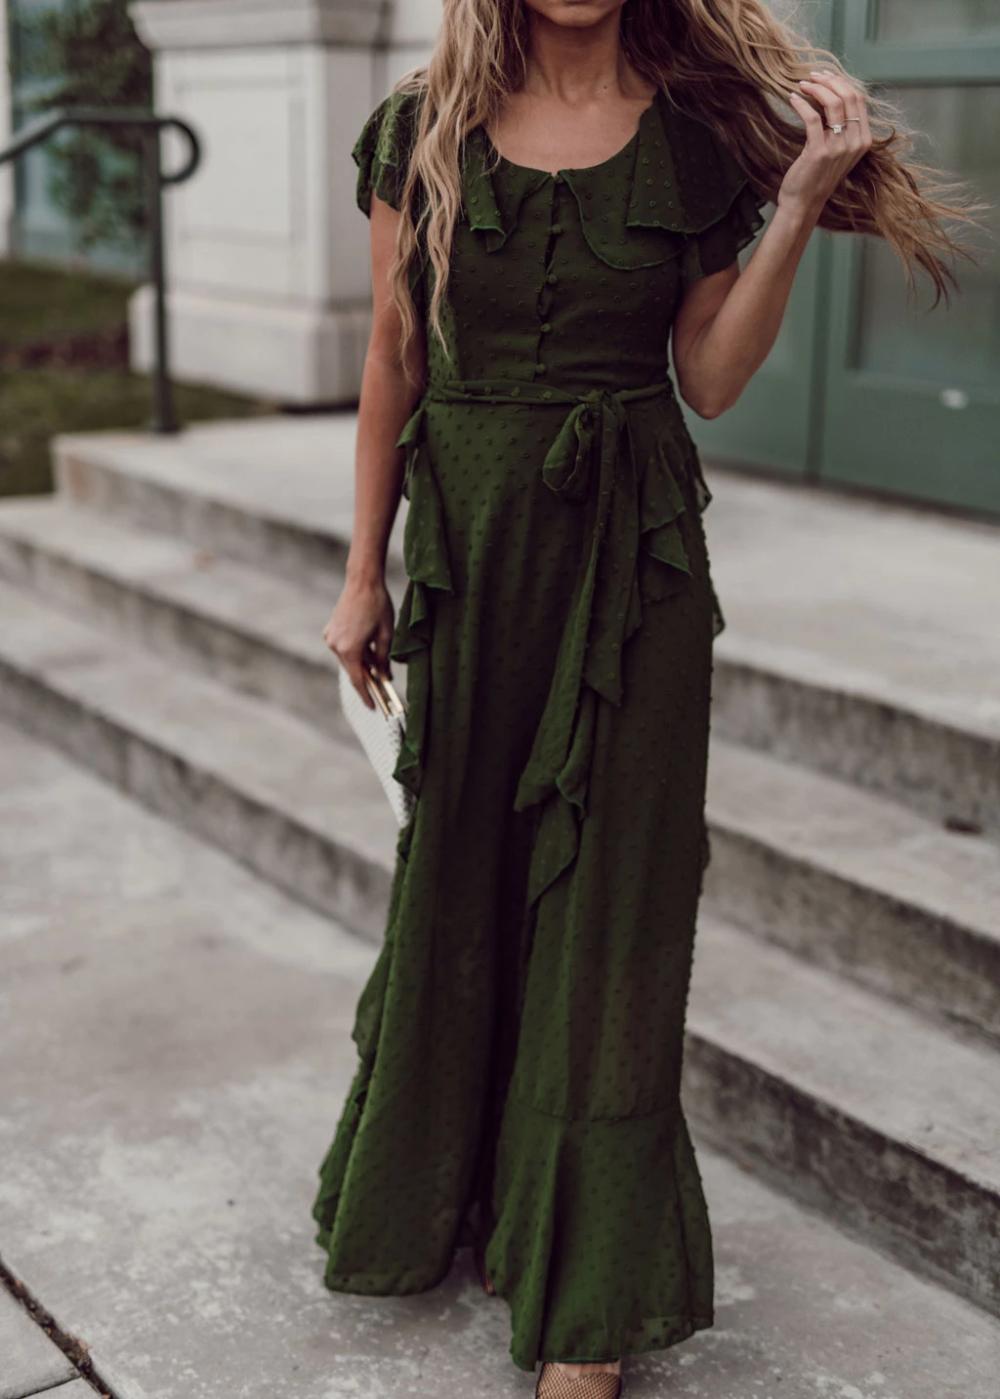 Enchanted Swiss Dot Maxi Dress Jessakae Headband Modest Dress Maxi Dress Ootd Dressy Wavy Hair Style W Women Easter Outfits Modest Dresses Maxi Dress [ 1399 x 1000 Pixel ]